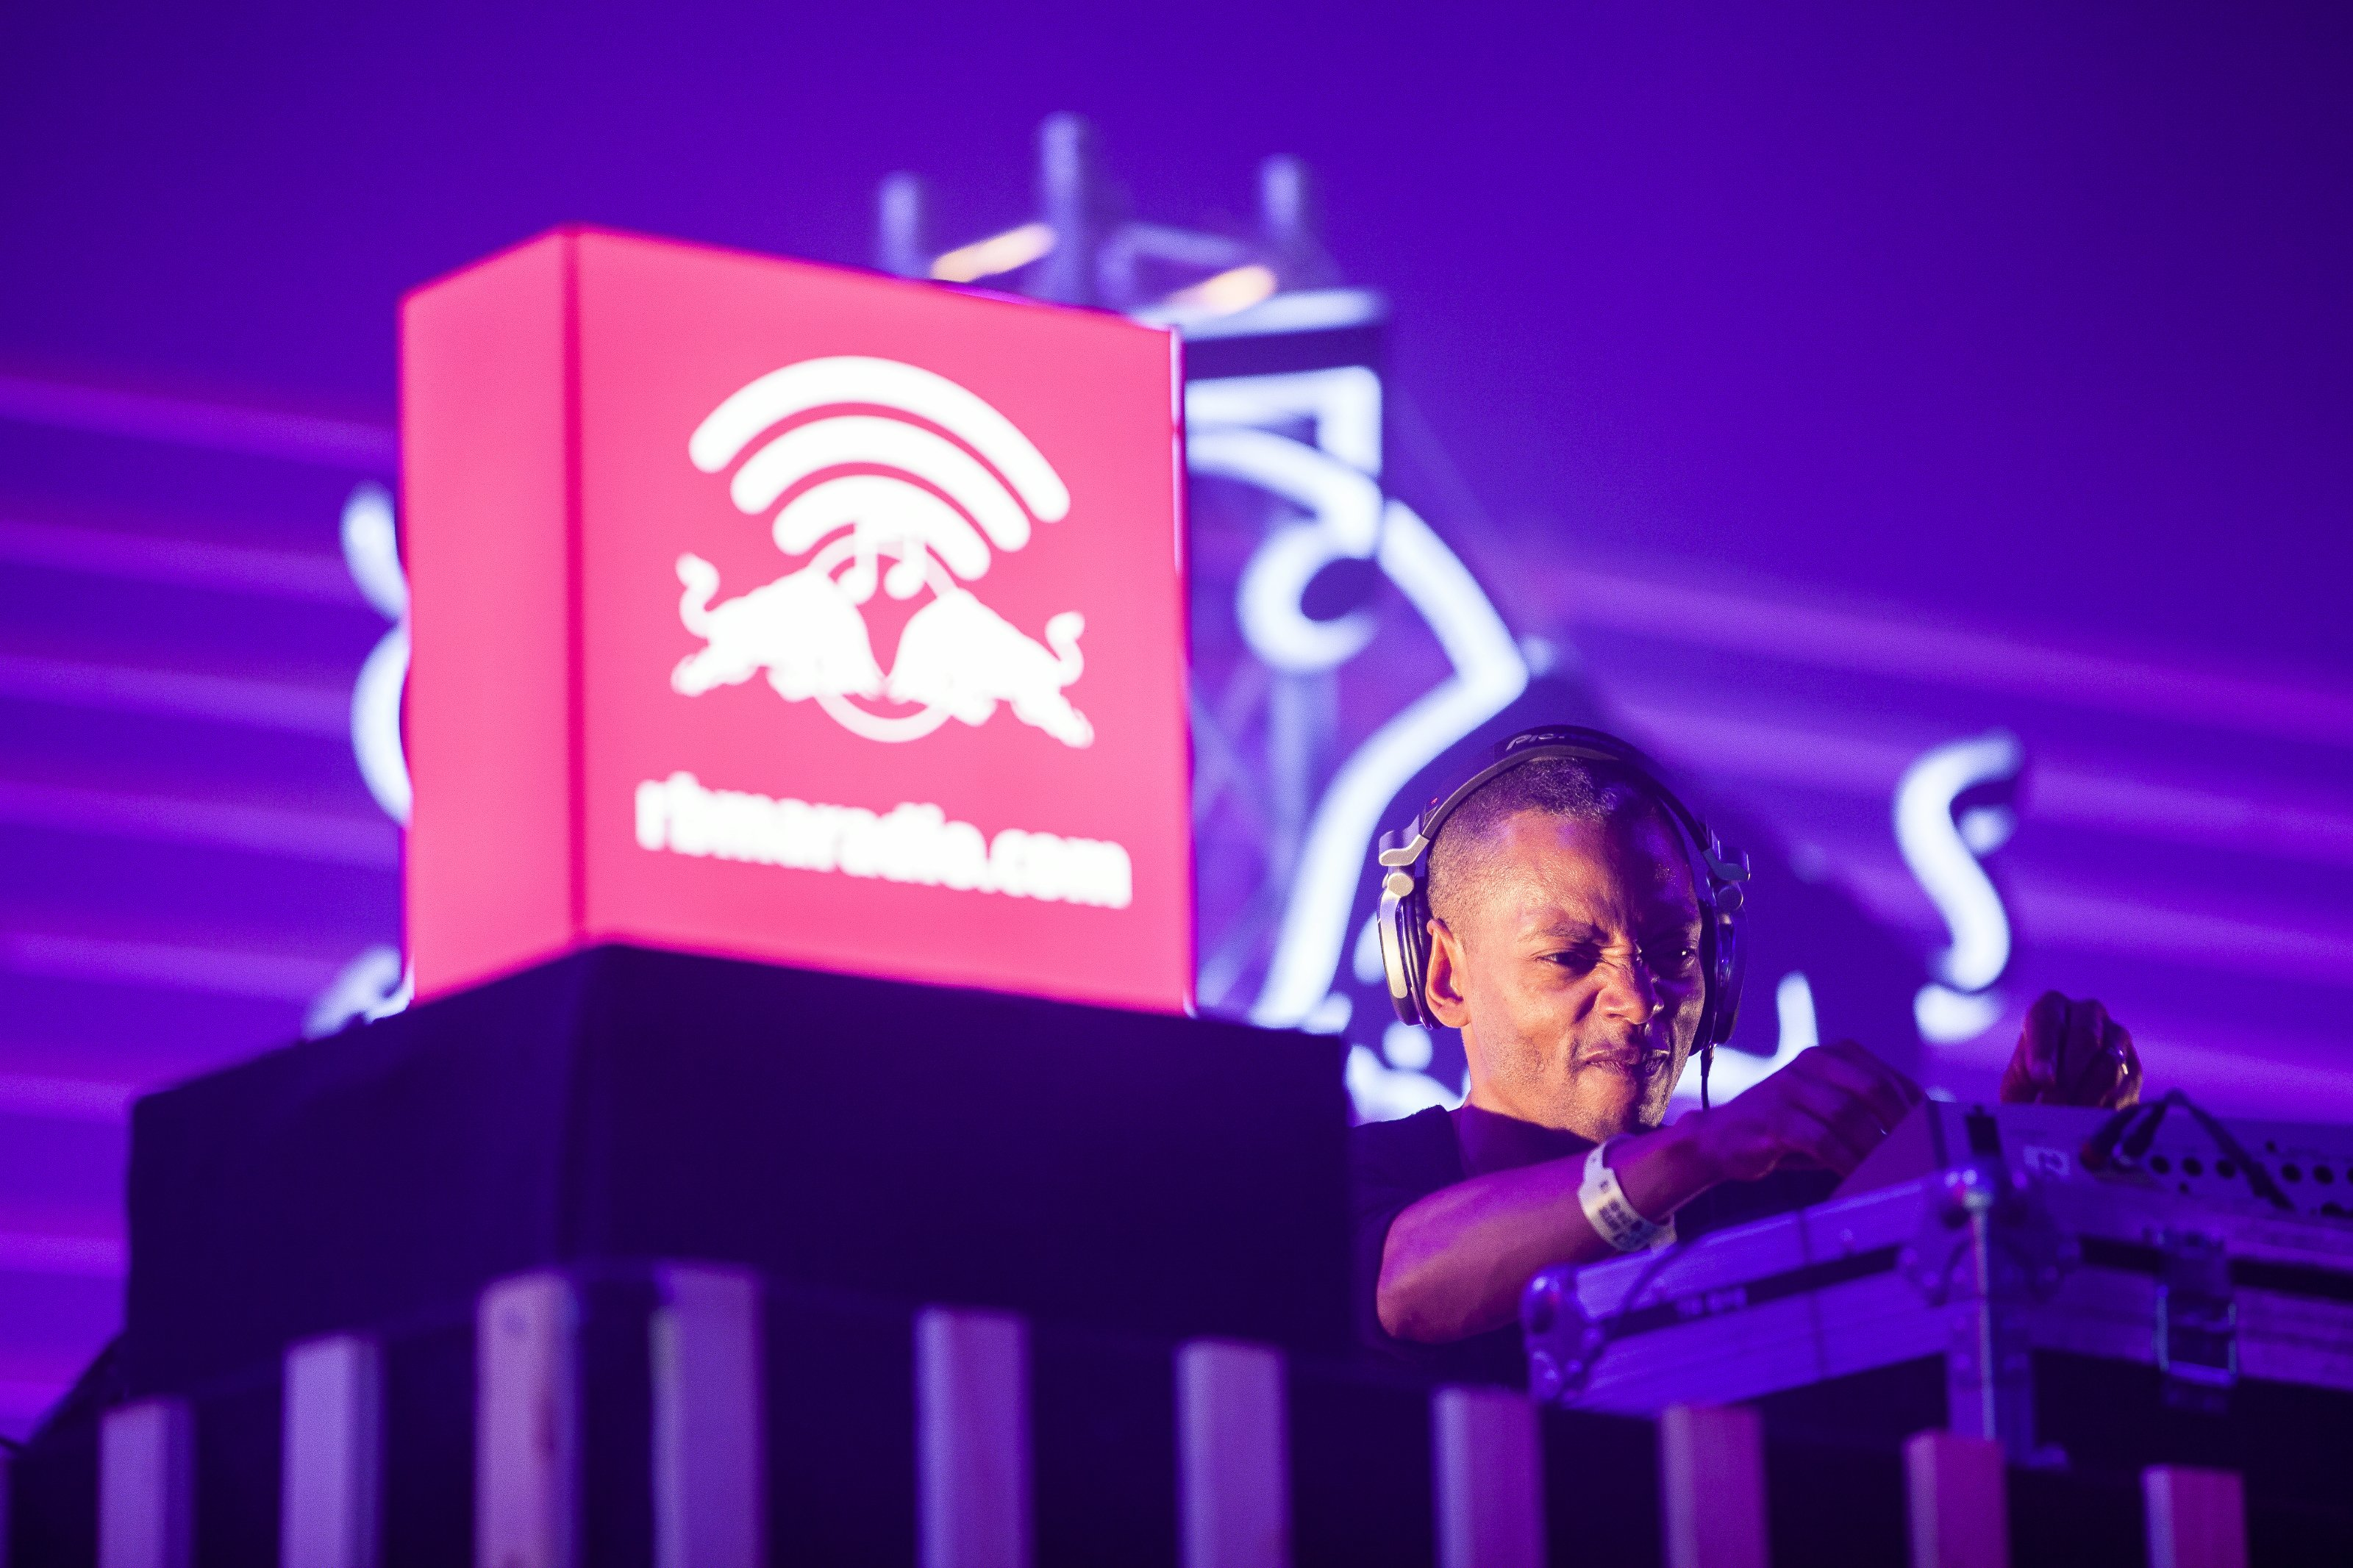 JeffMills_RBMA®TomDoms  LA 20º EDICIÓN DE LA RED BULL MUSIC ACADEMY VUELVE A BERLÍN EN 2018 JeffMills RBMA  TomDoms